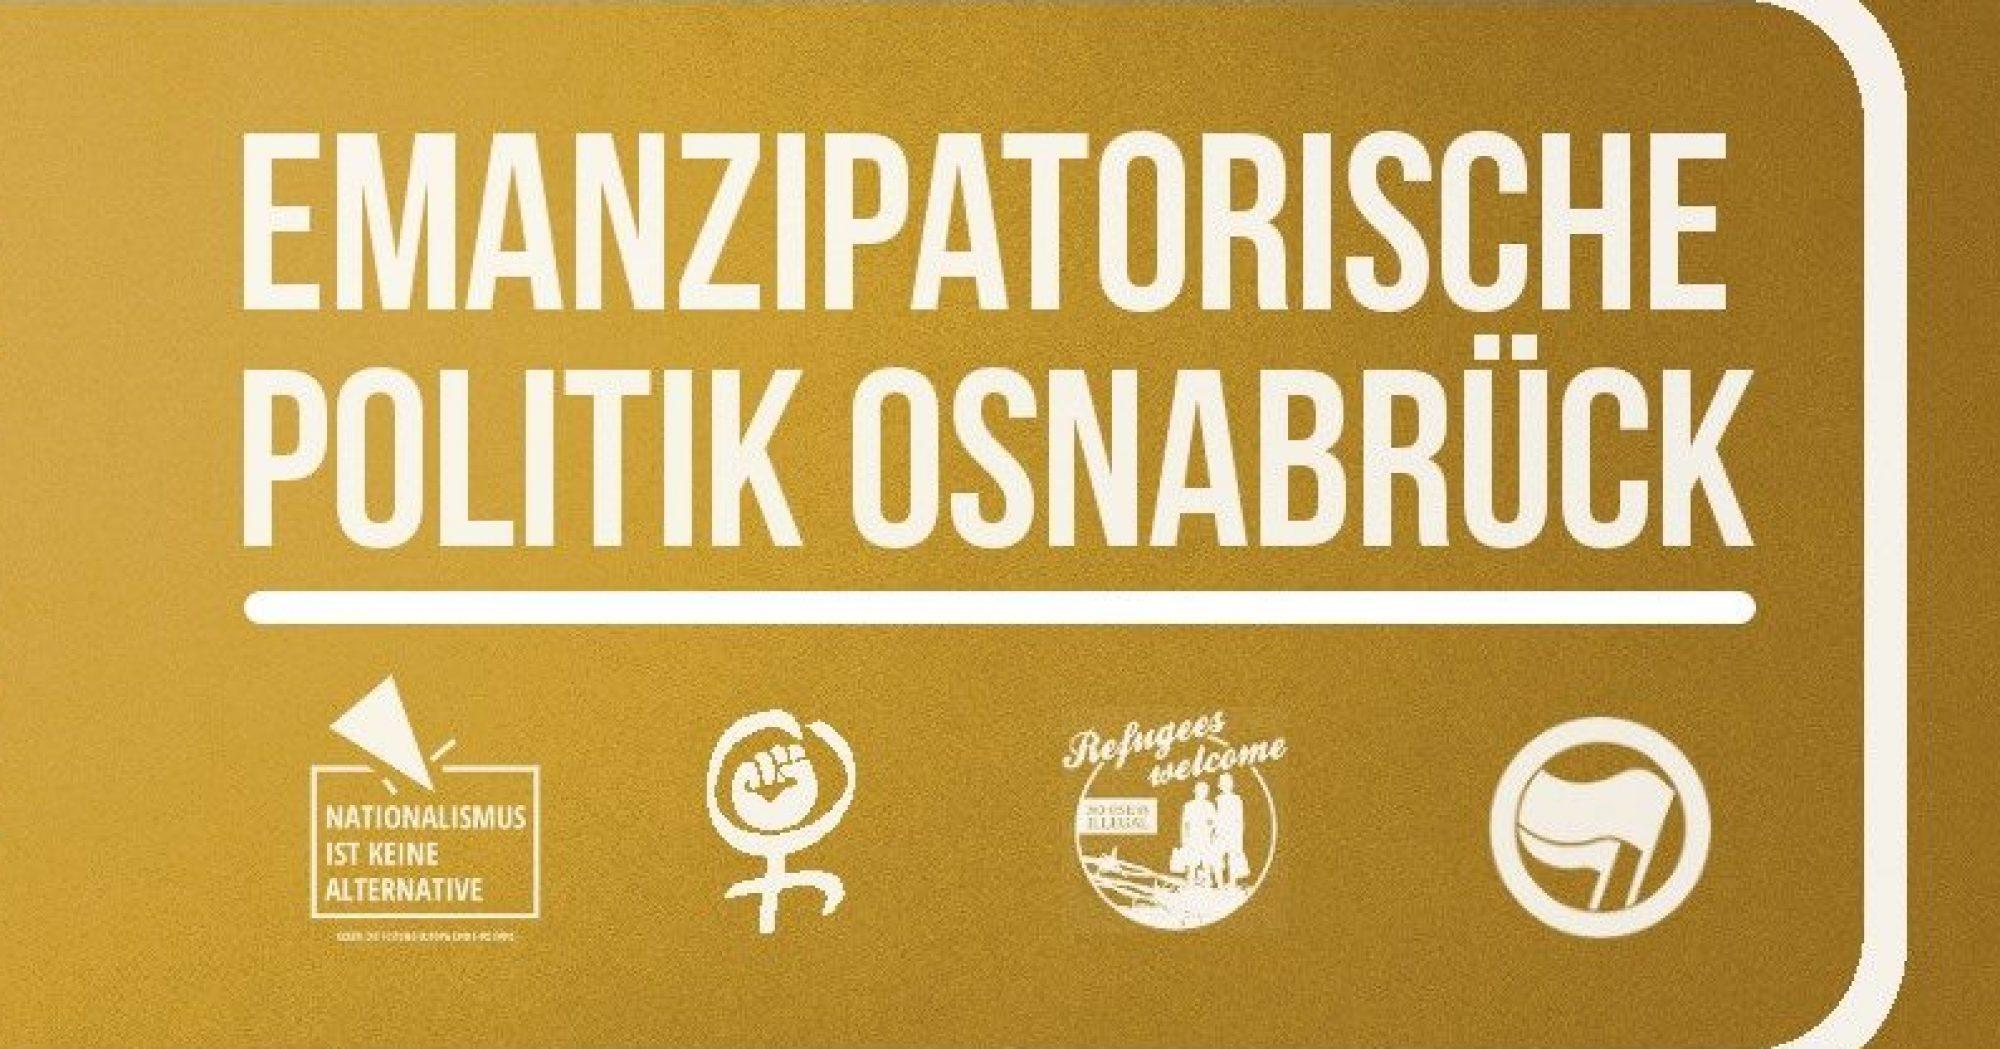 Emanzipatorische Politik Osnabrueck